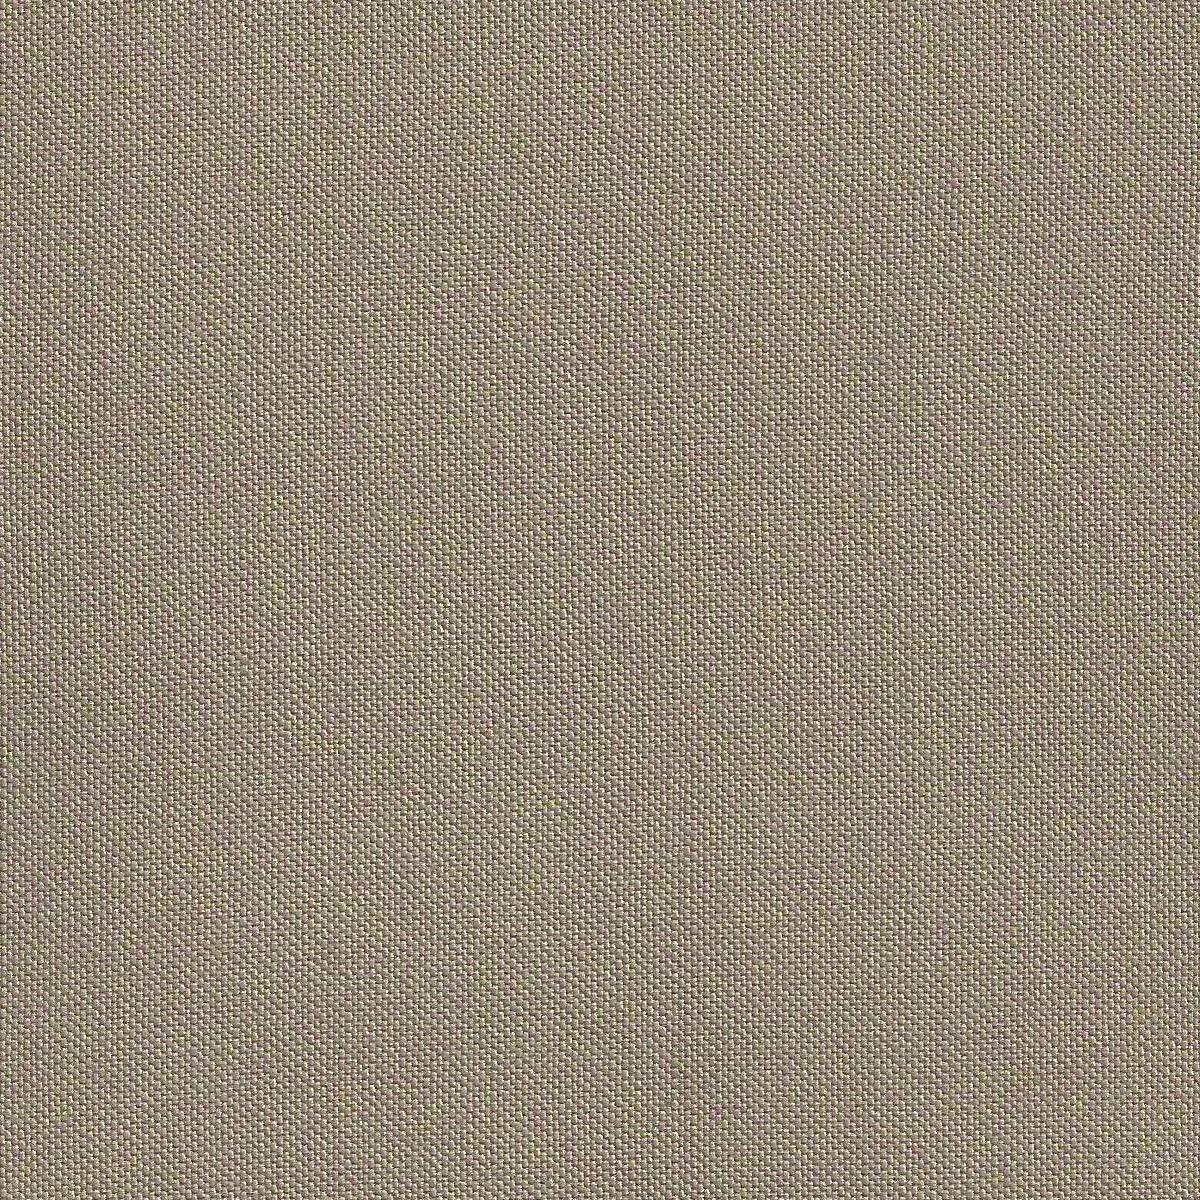 Spradling Simtex SIM-077717 Vinyl Fabric ギフ_包装 Beige 5 希望者のみラッピング無料 by 54